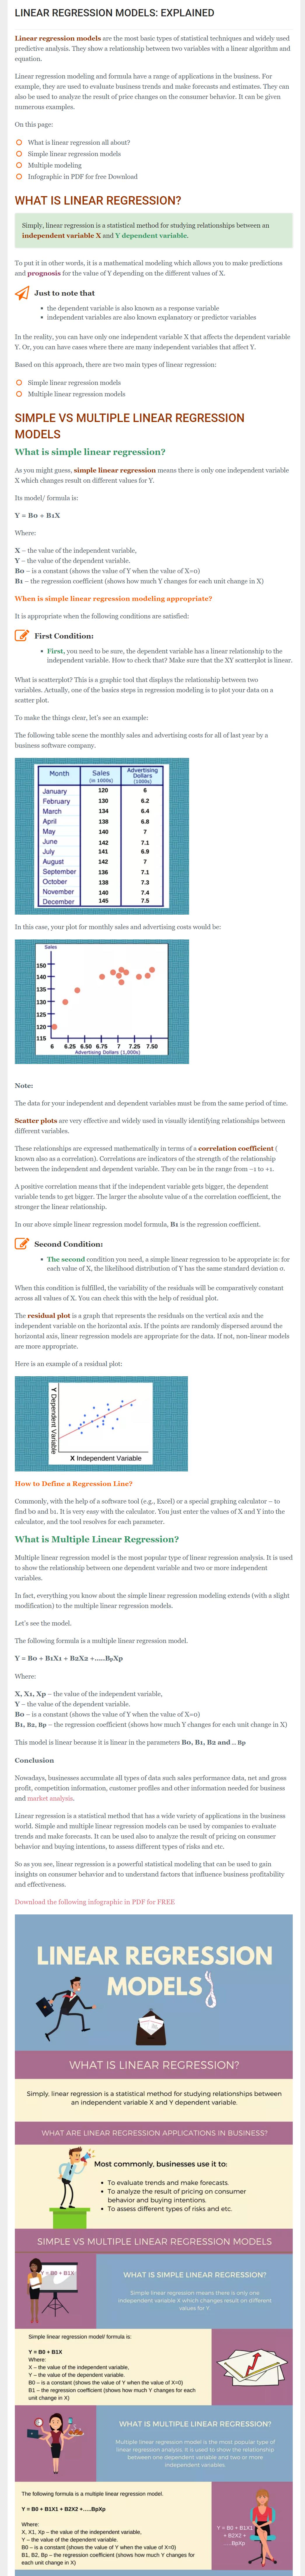 linear regression models